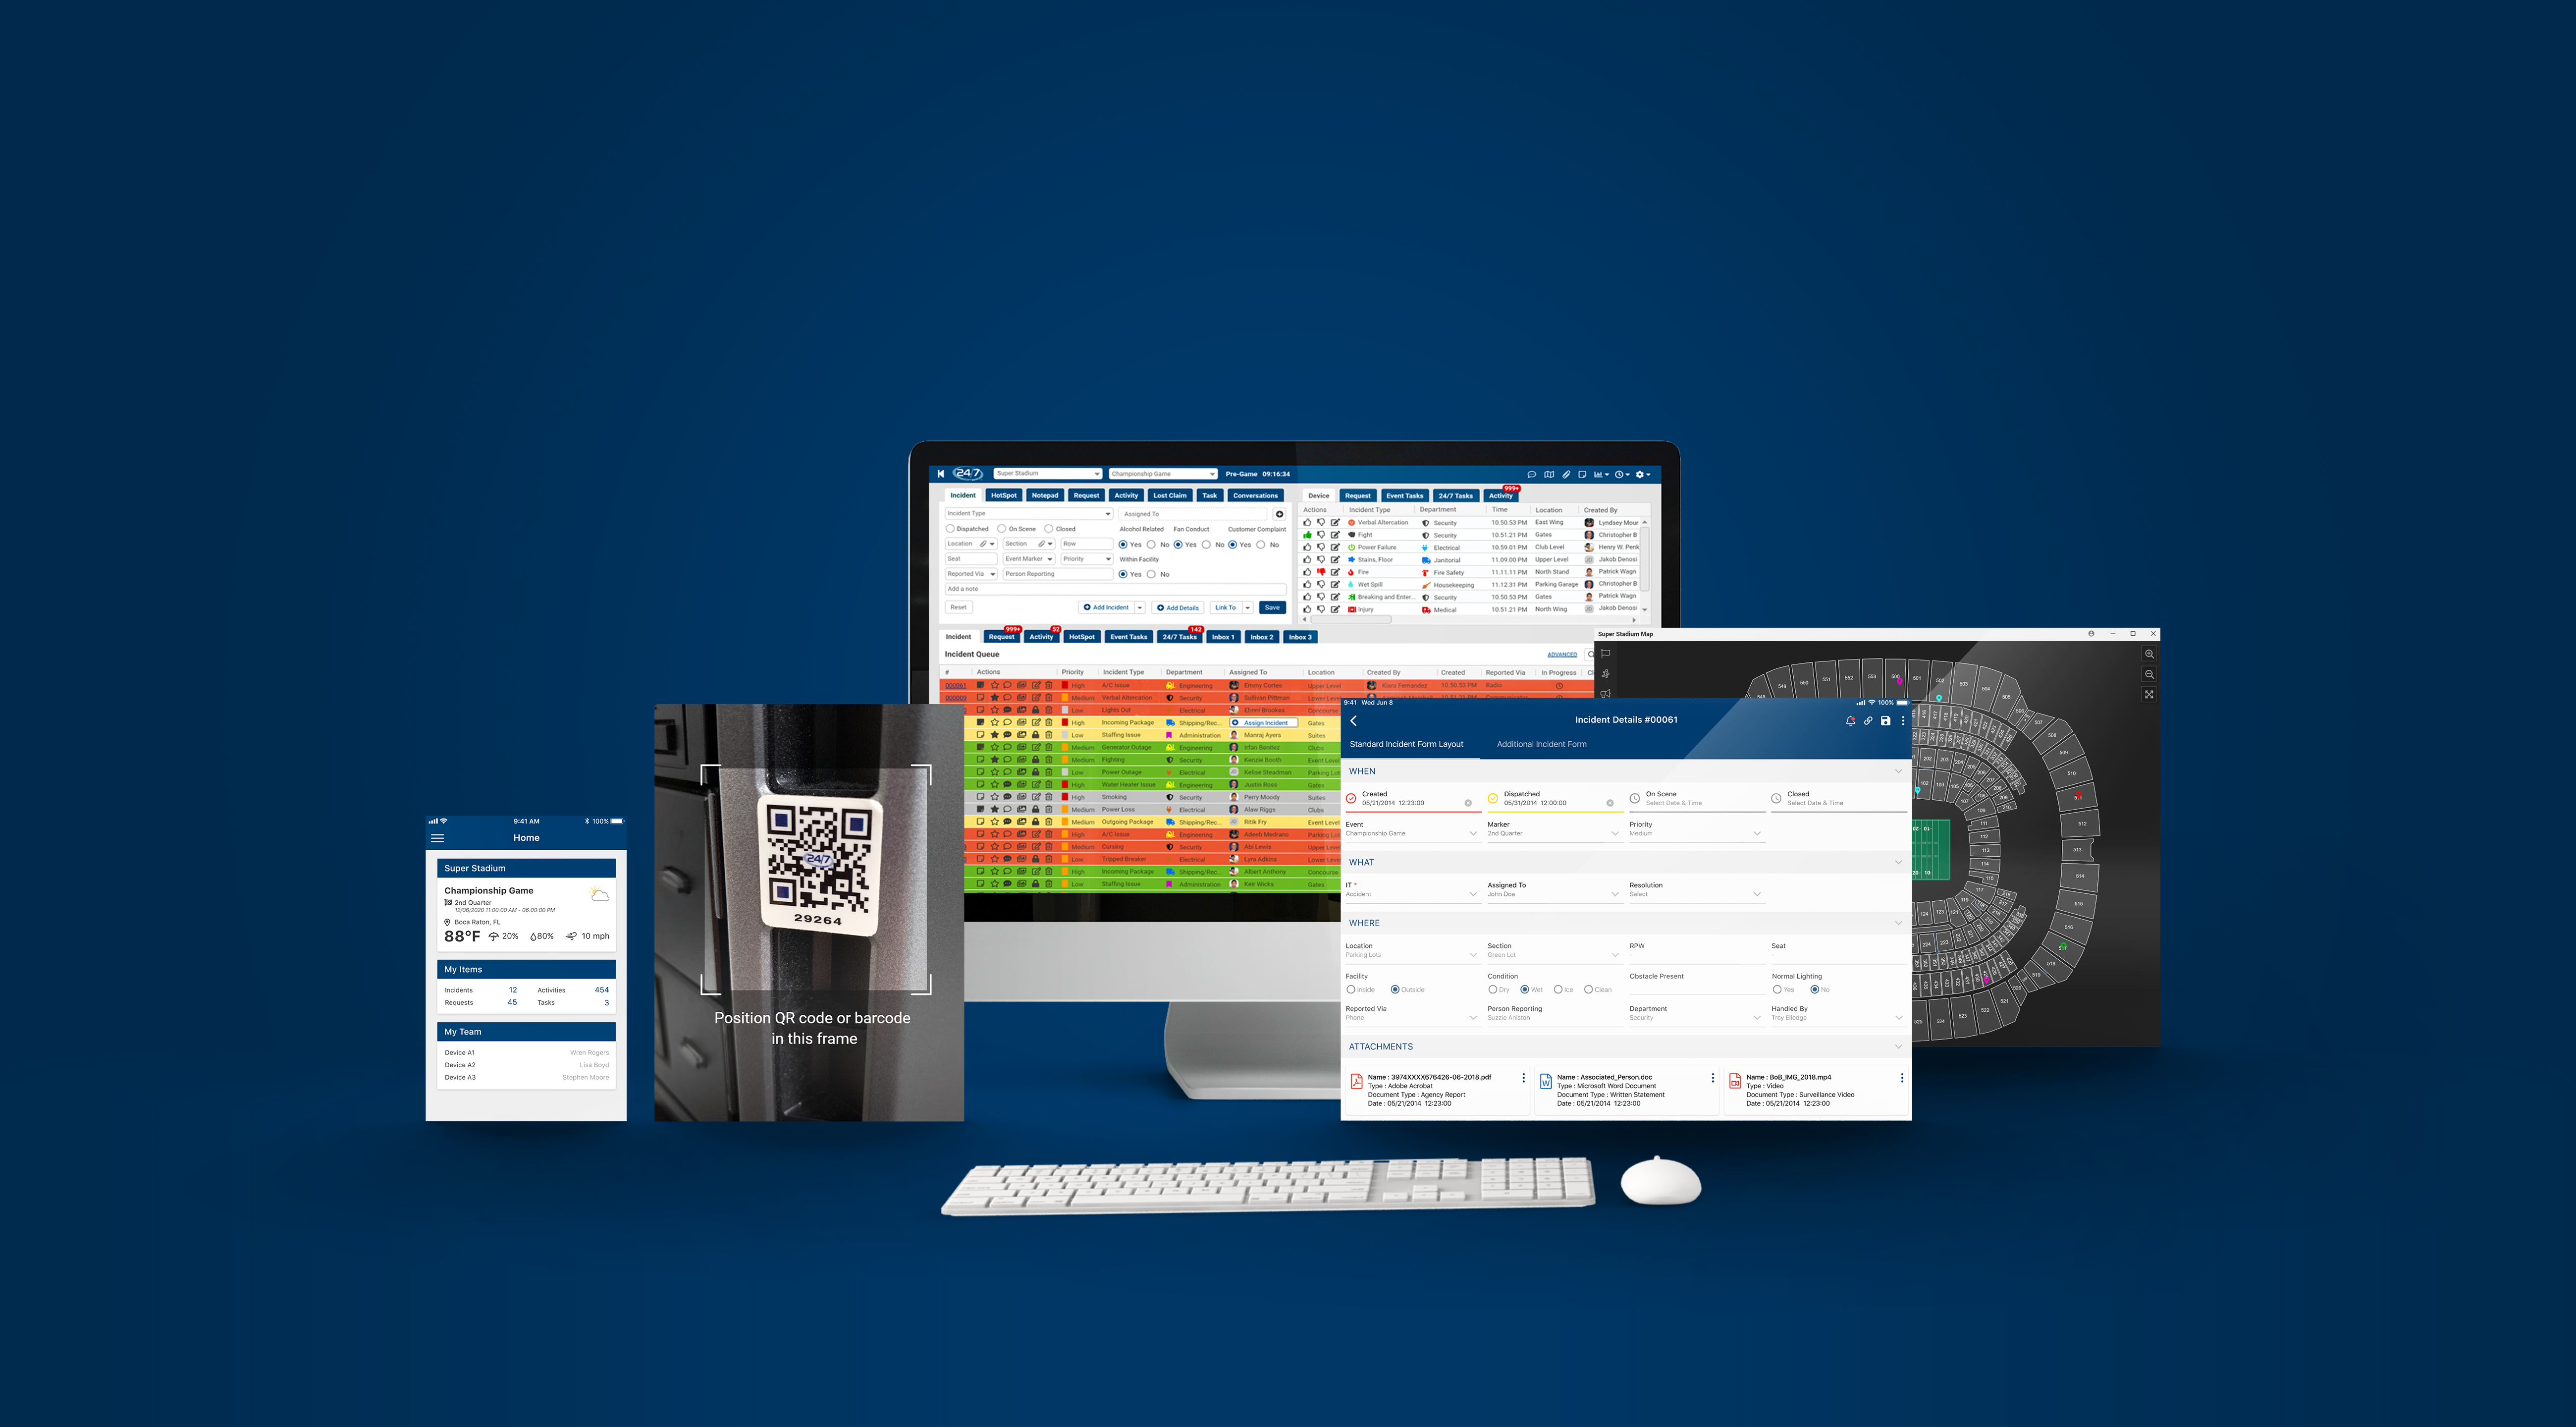 All-New 24/7 Software Platform Screens